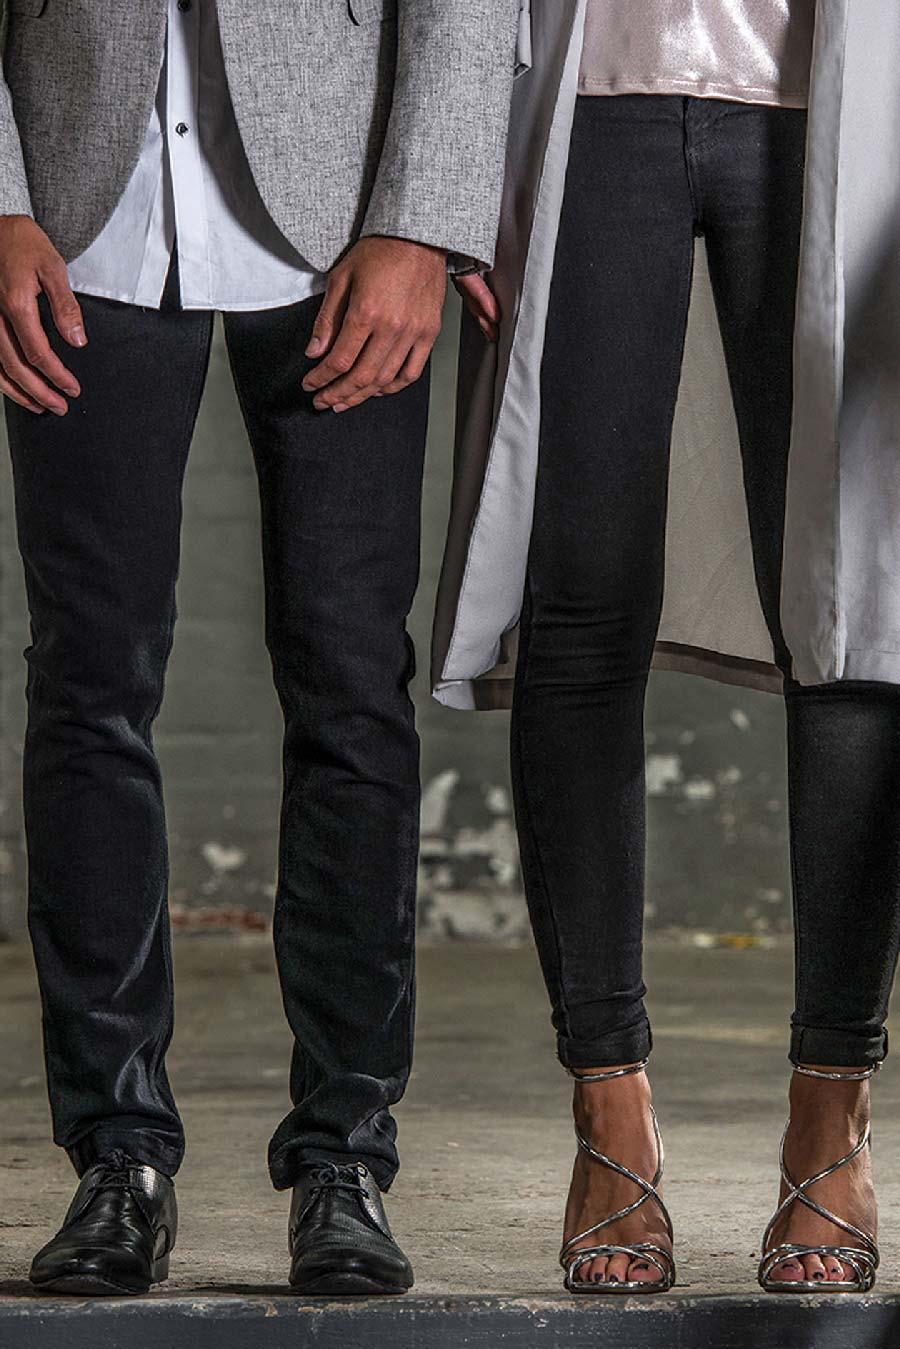 2dbb0df27a2a The new Men's Max Slim Jeans and the Ladies Lara Skinny Jeans in black denim